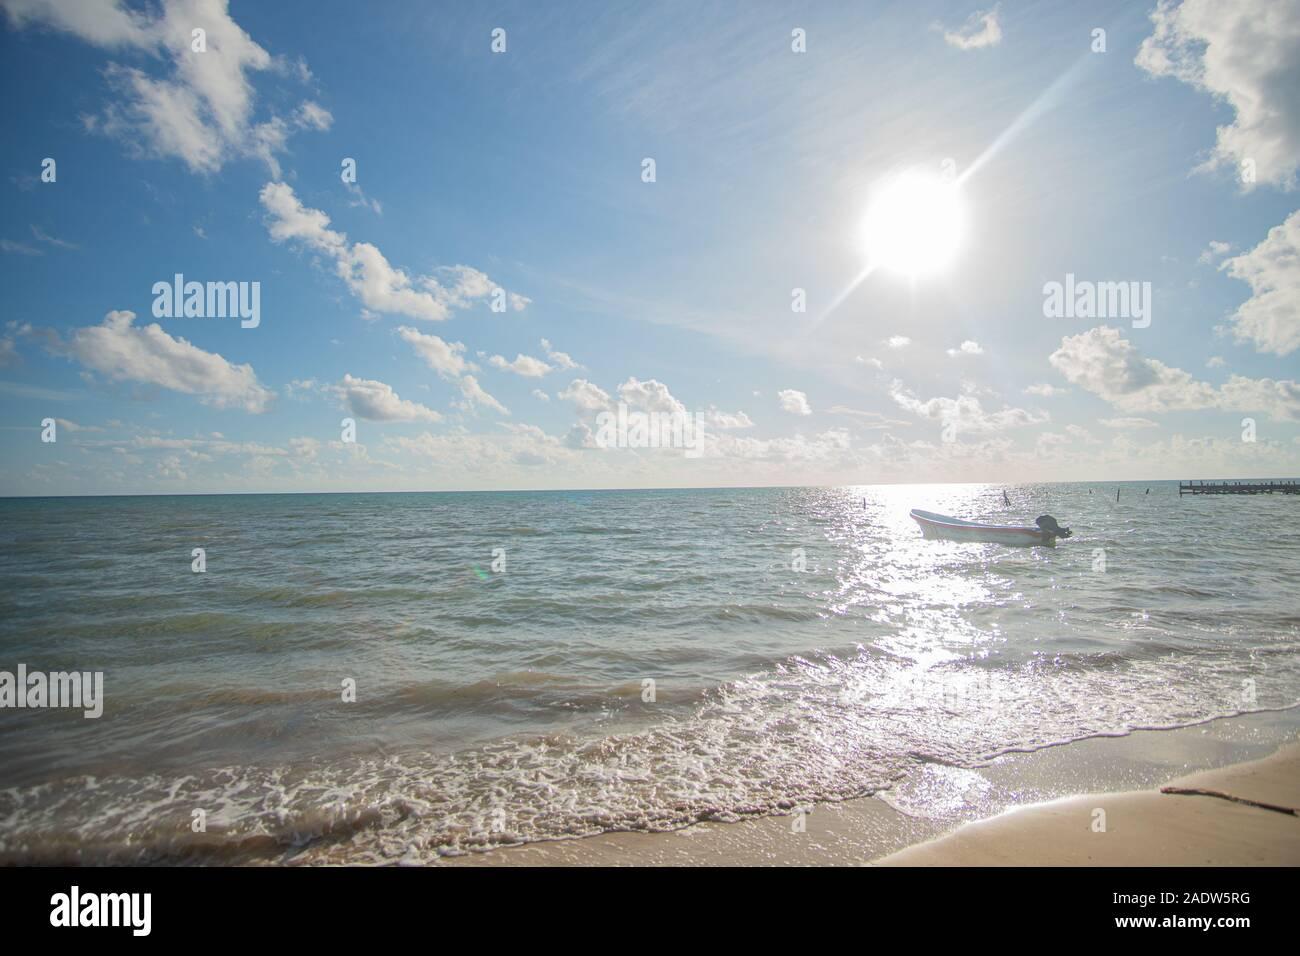 Himmlische Strand in Punta Allen am karibischen Meer Stockfoto